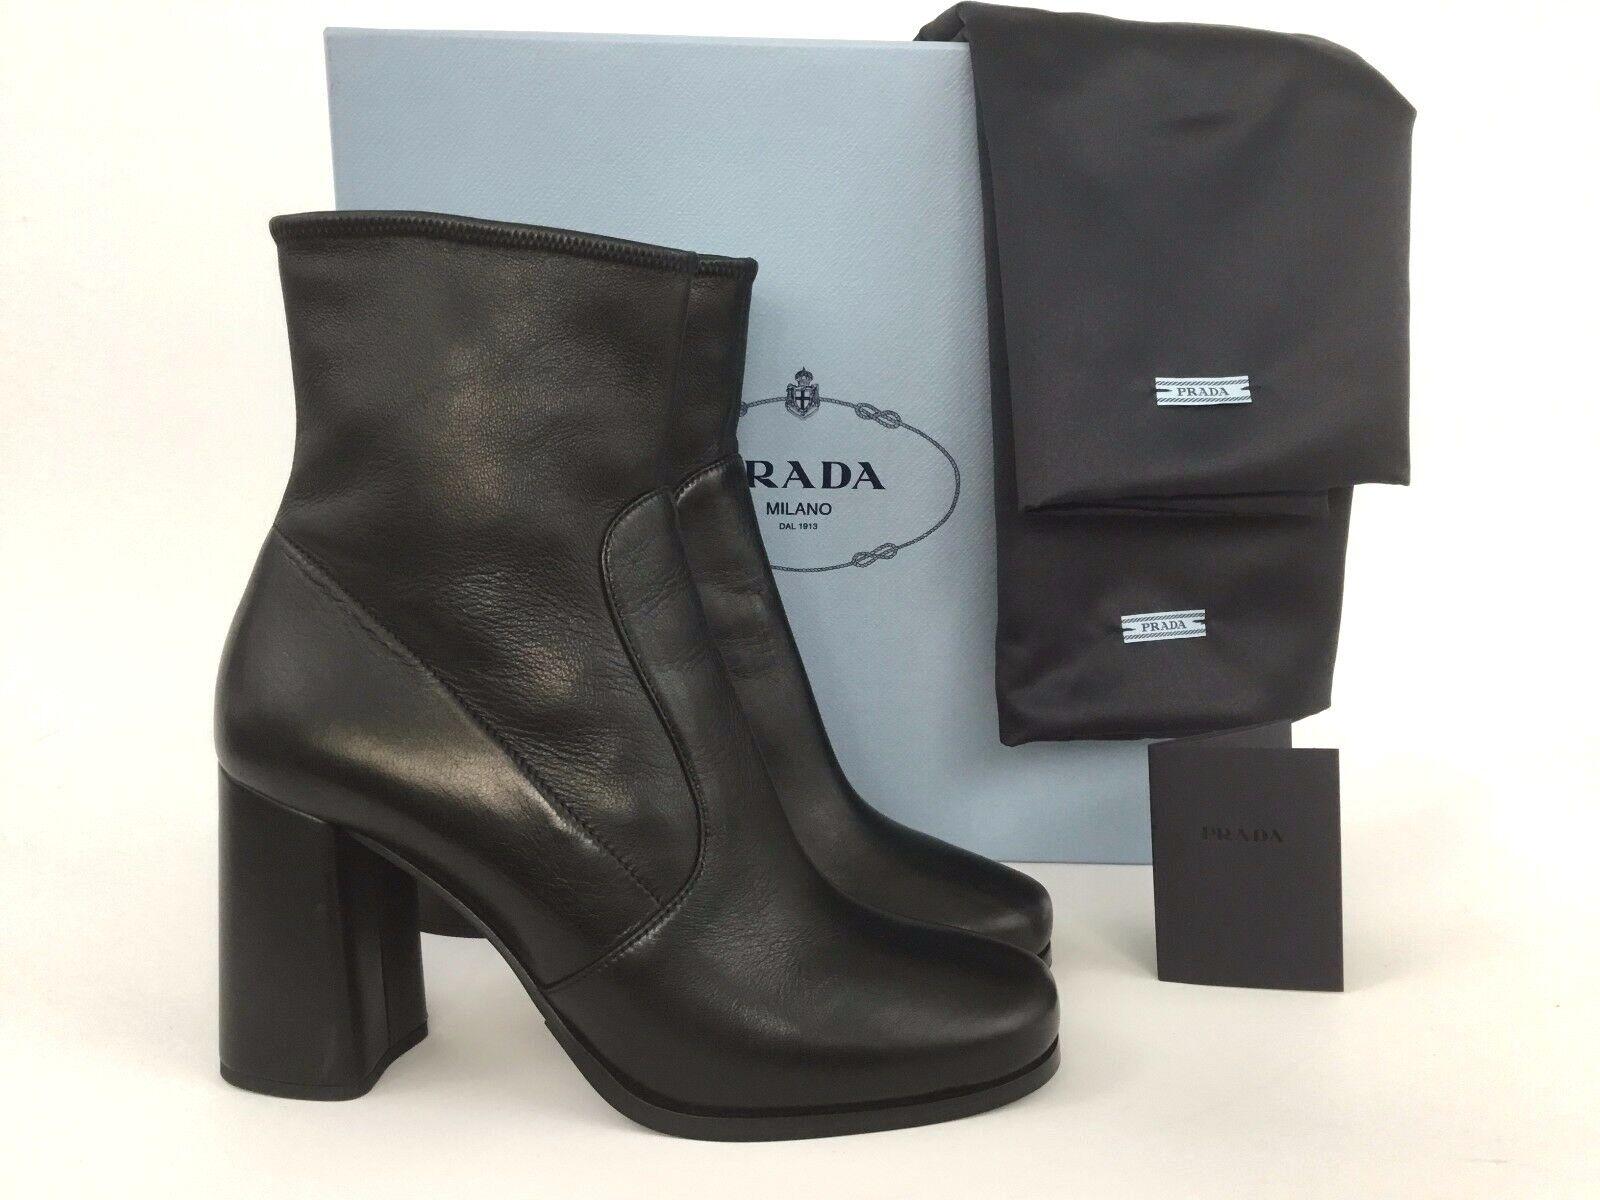 PRADA Black Leather Block Heel Side Zip Stretch Bootie 40 10